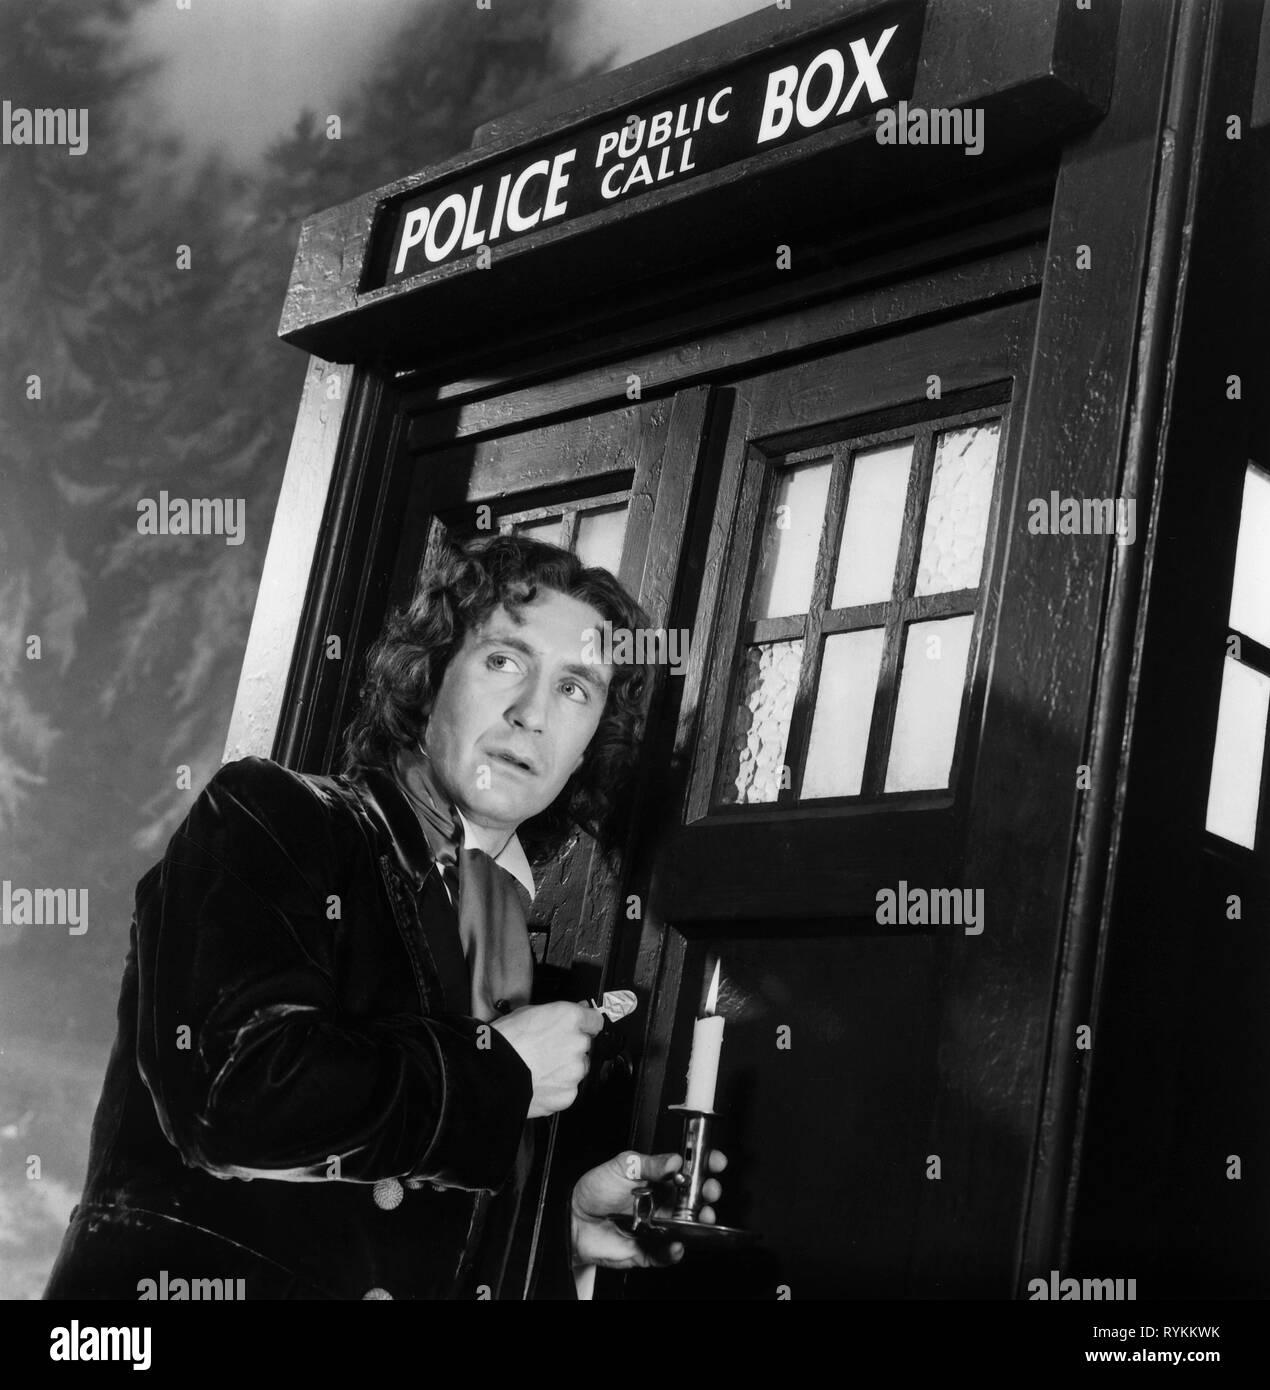 PAUL MCGANN, DOCTOR WHO, 1996 - Stock Image